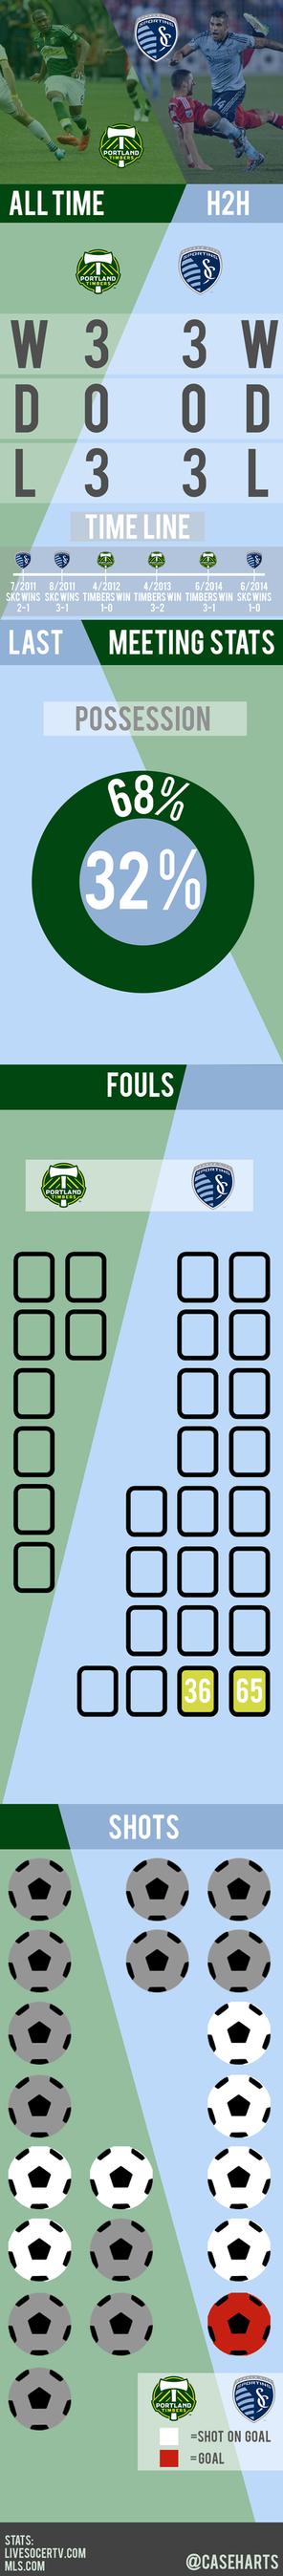 Portland Vs Sporting Kansas Infographic by caseharts